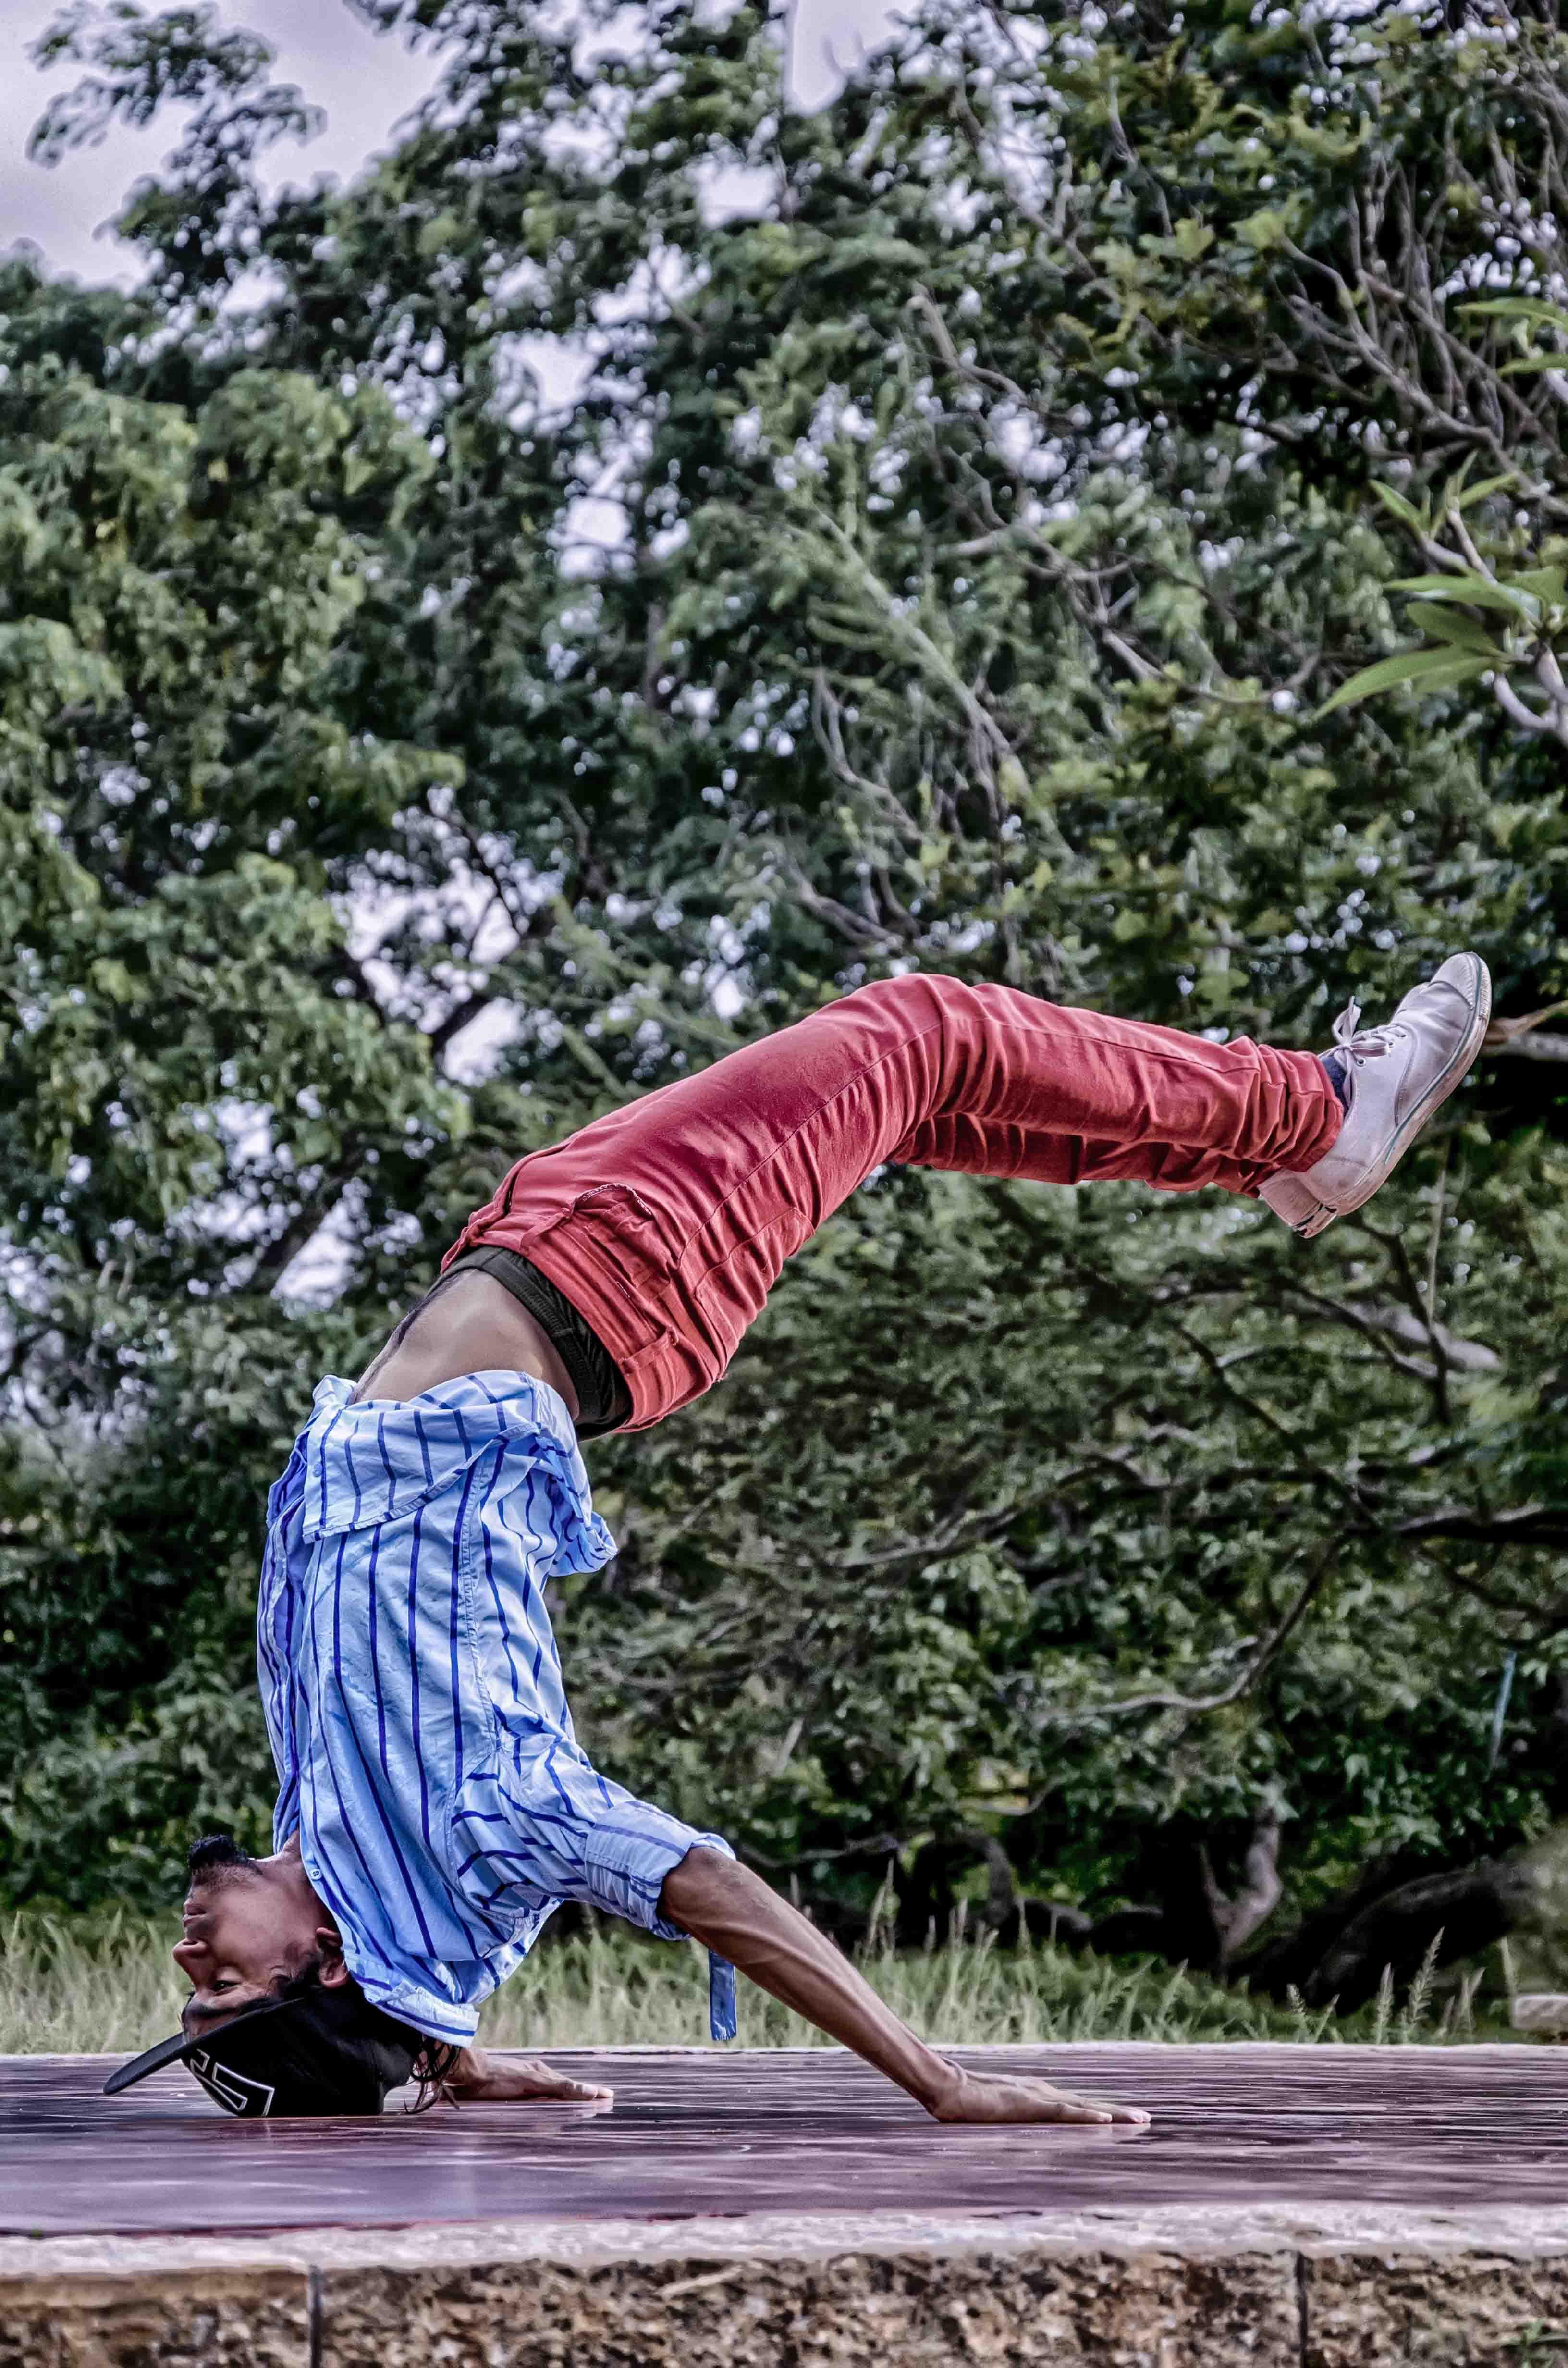 Street dancer flexible body capture photo